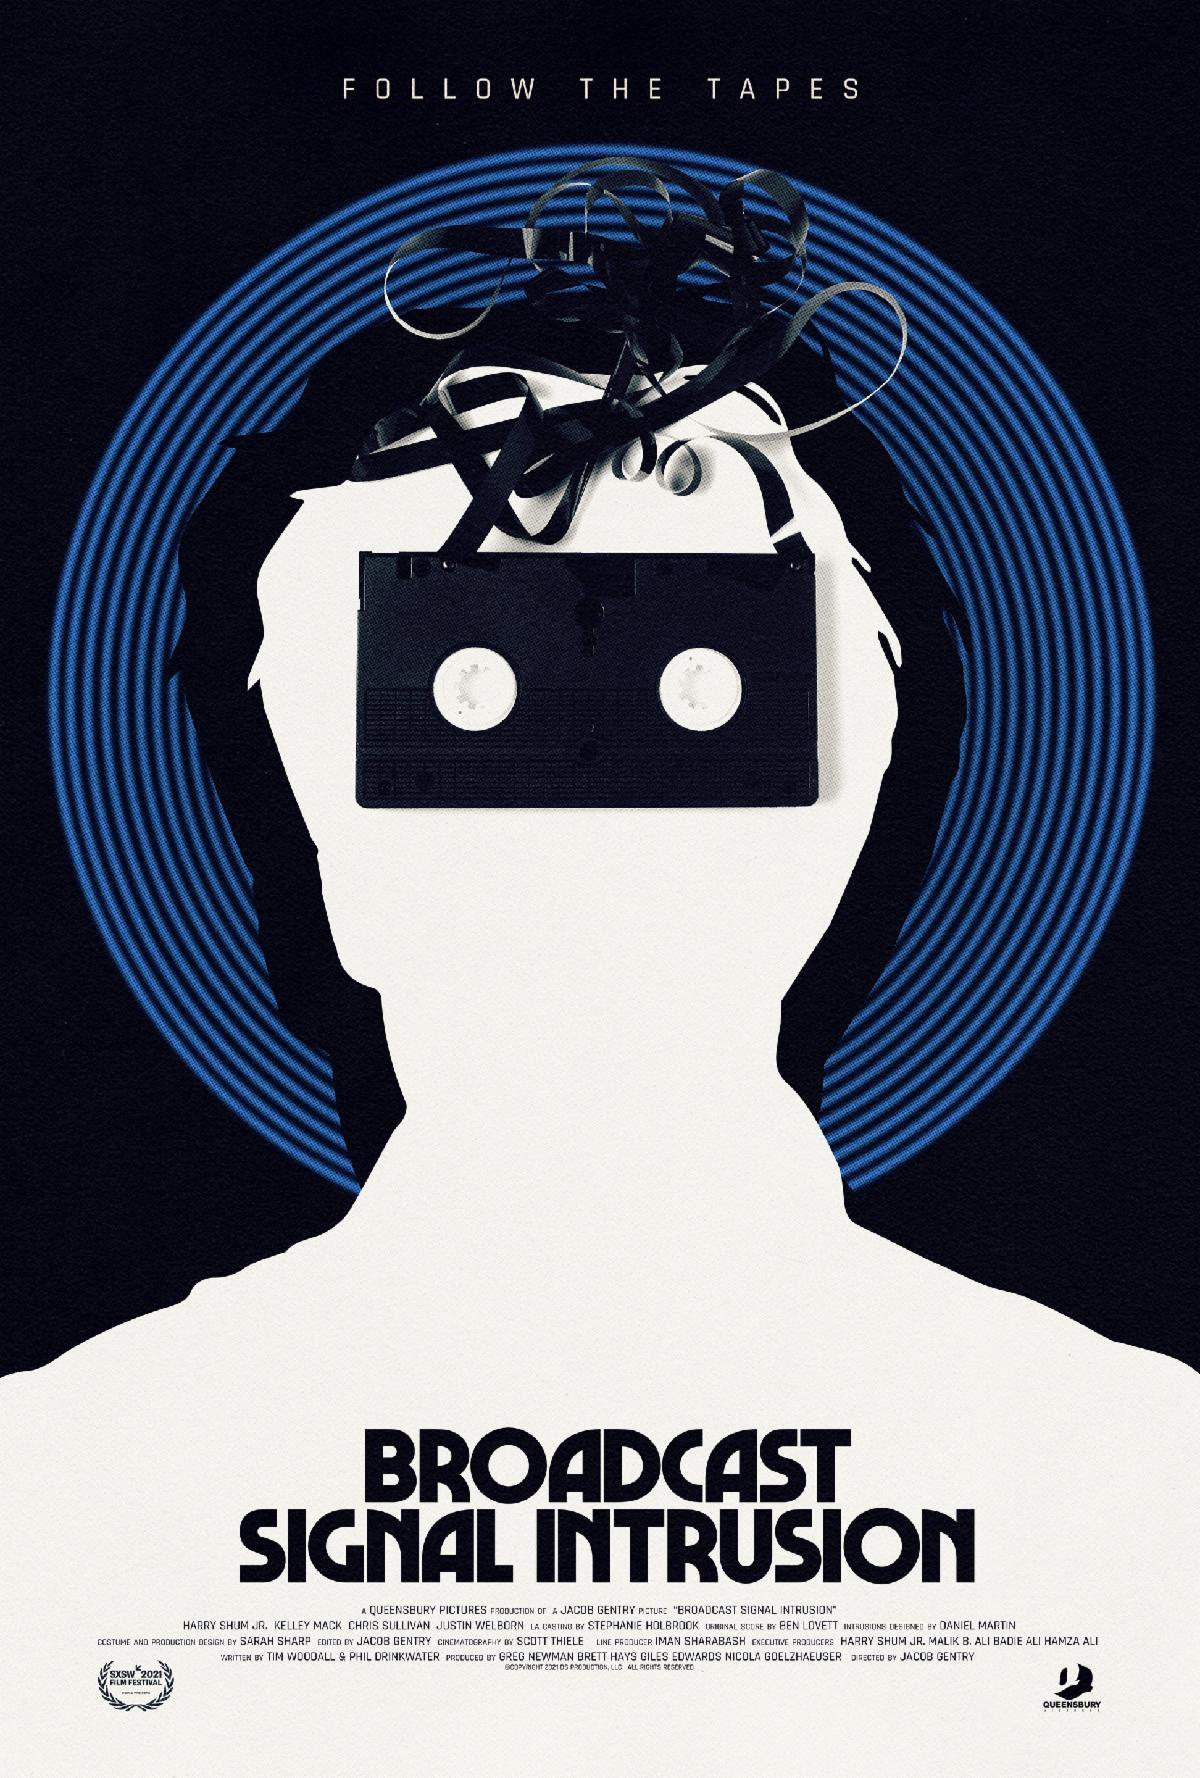 [News] BROADCAST SIGNAL INTRUSION Drops Poster Ahead of SXSW Premiere